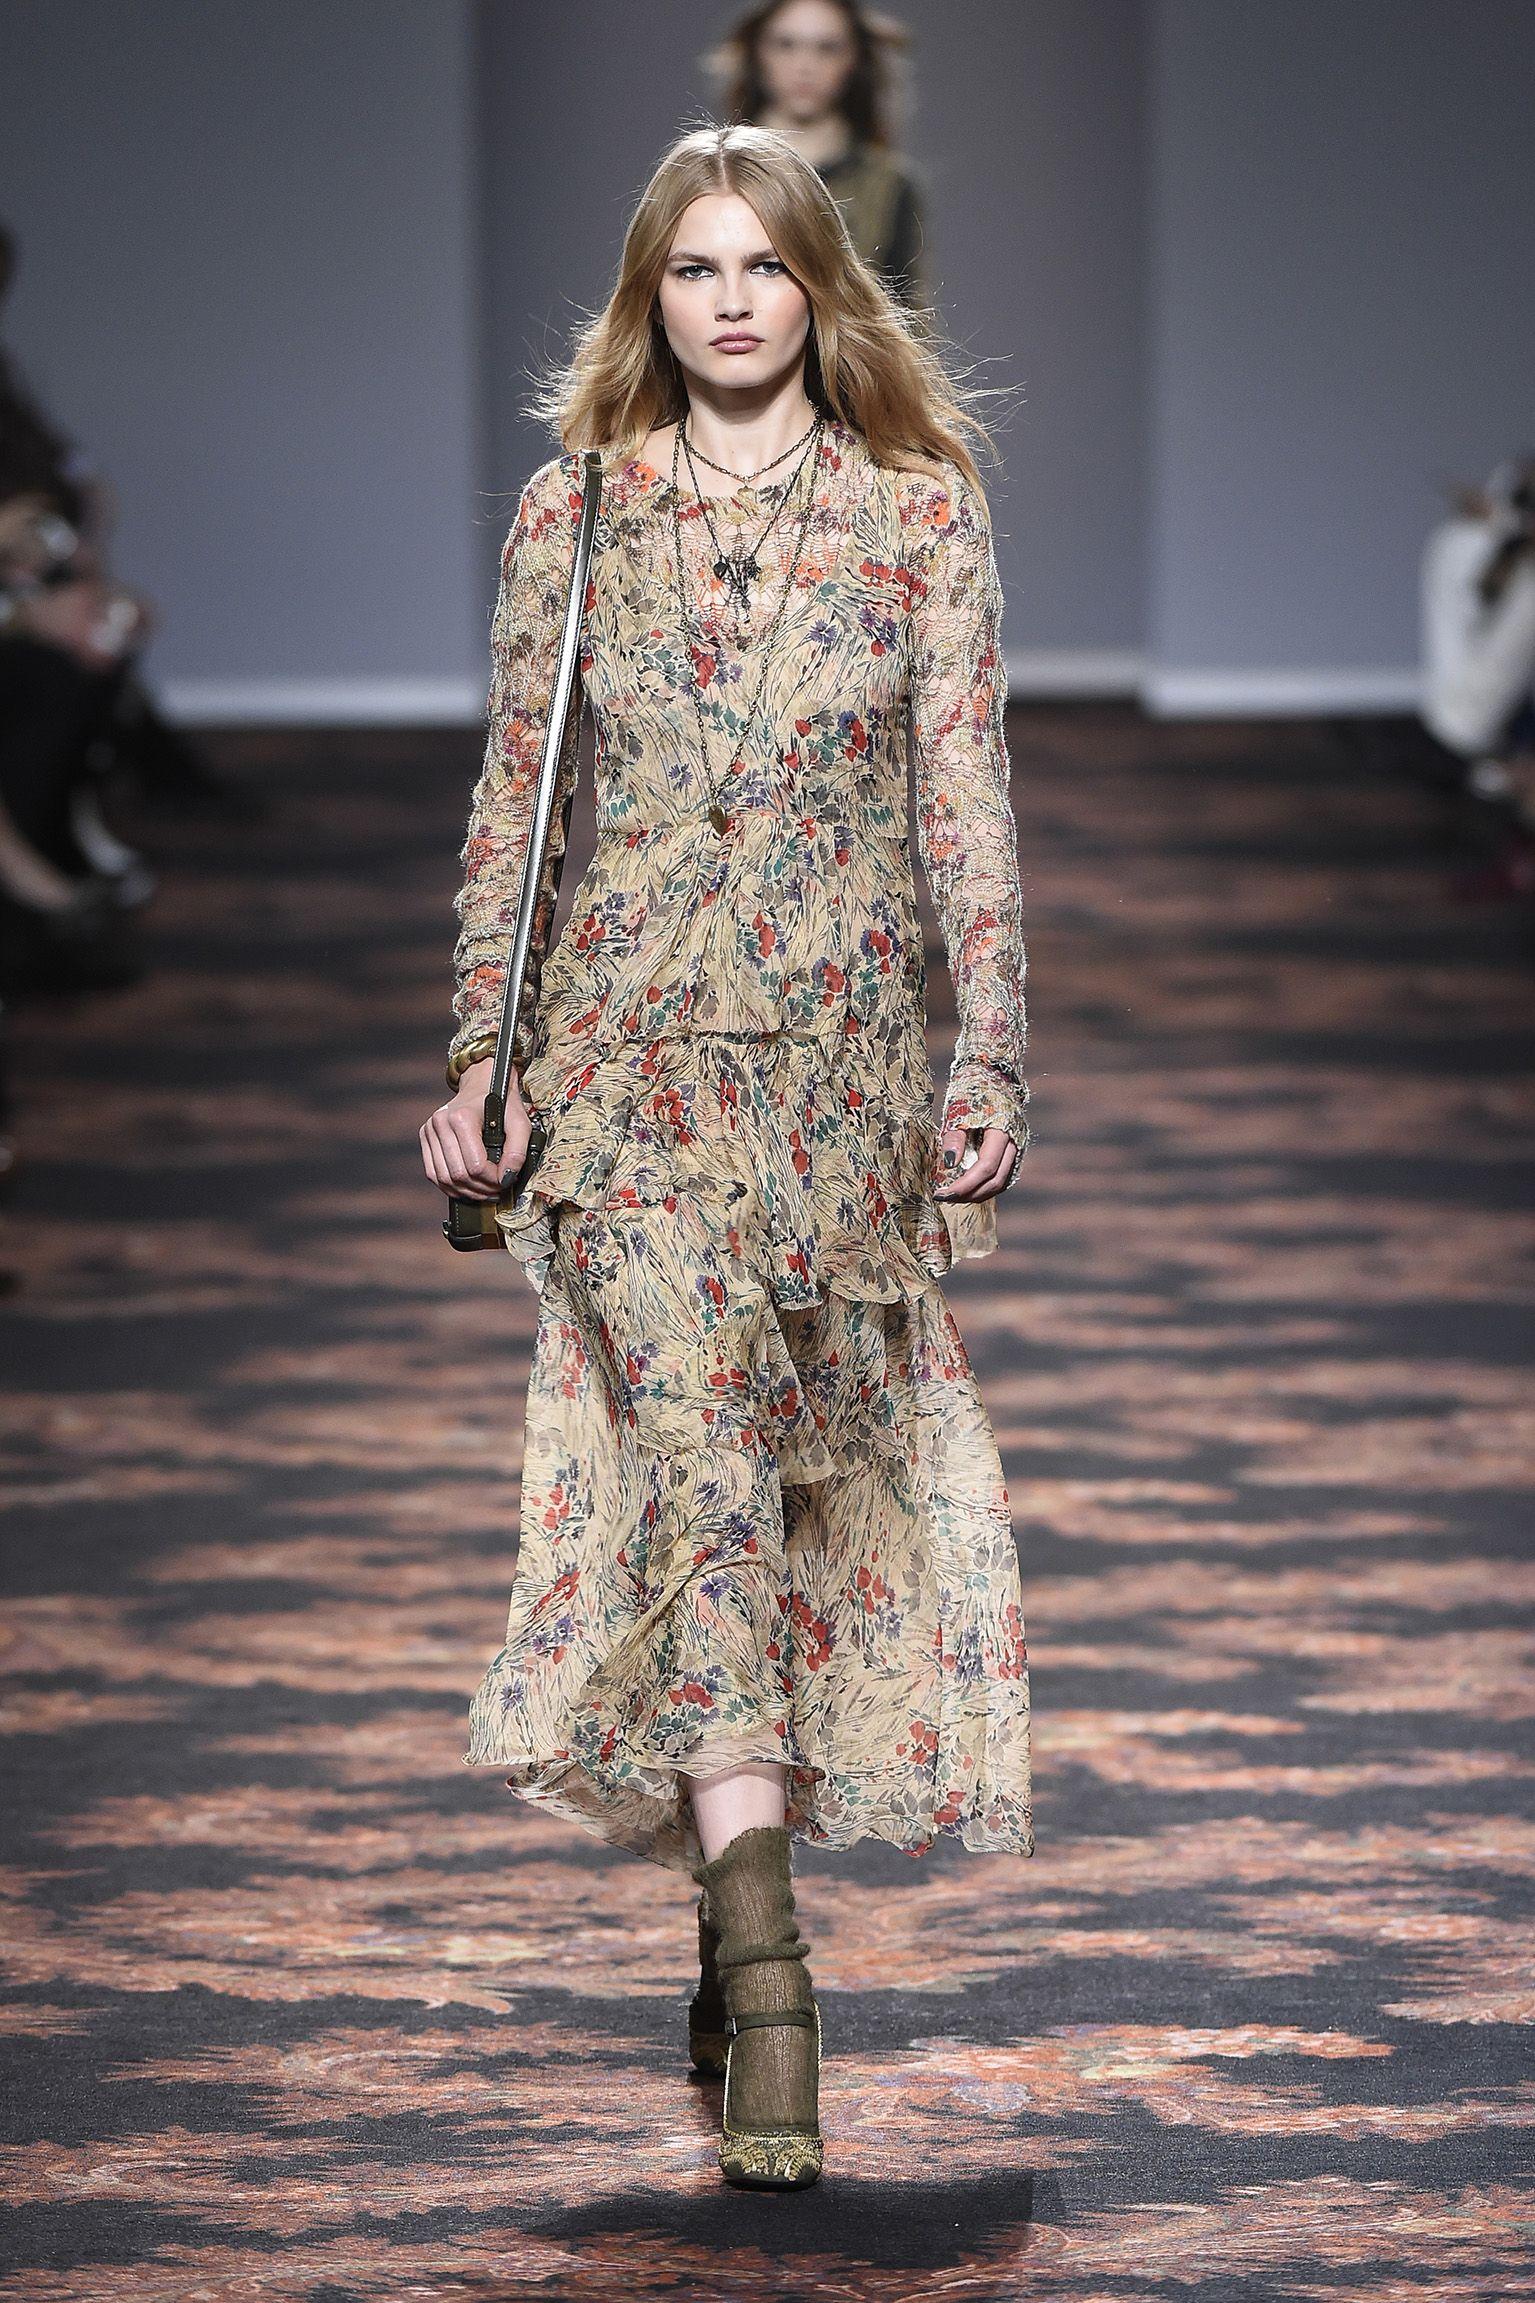 Pin By Jovana Petrovic On Fashion Fashion Fashion Show